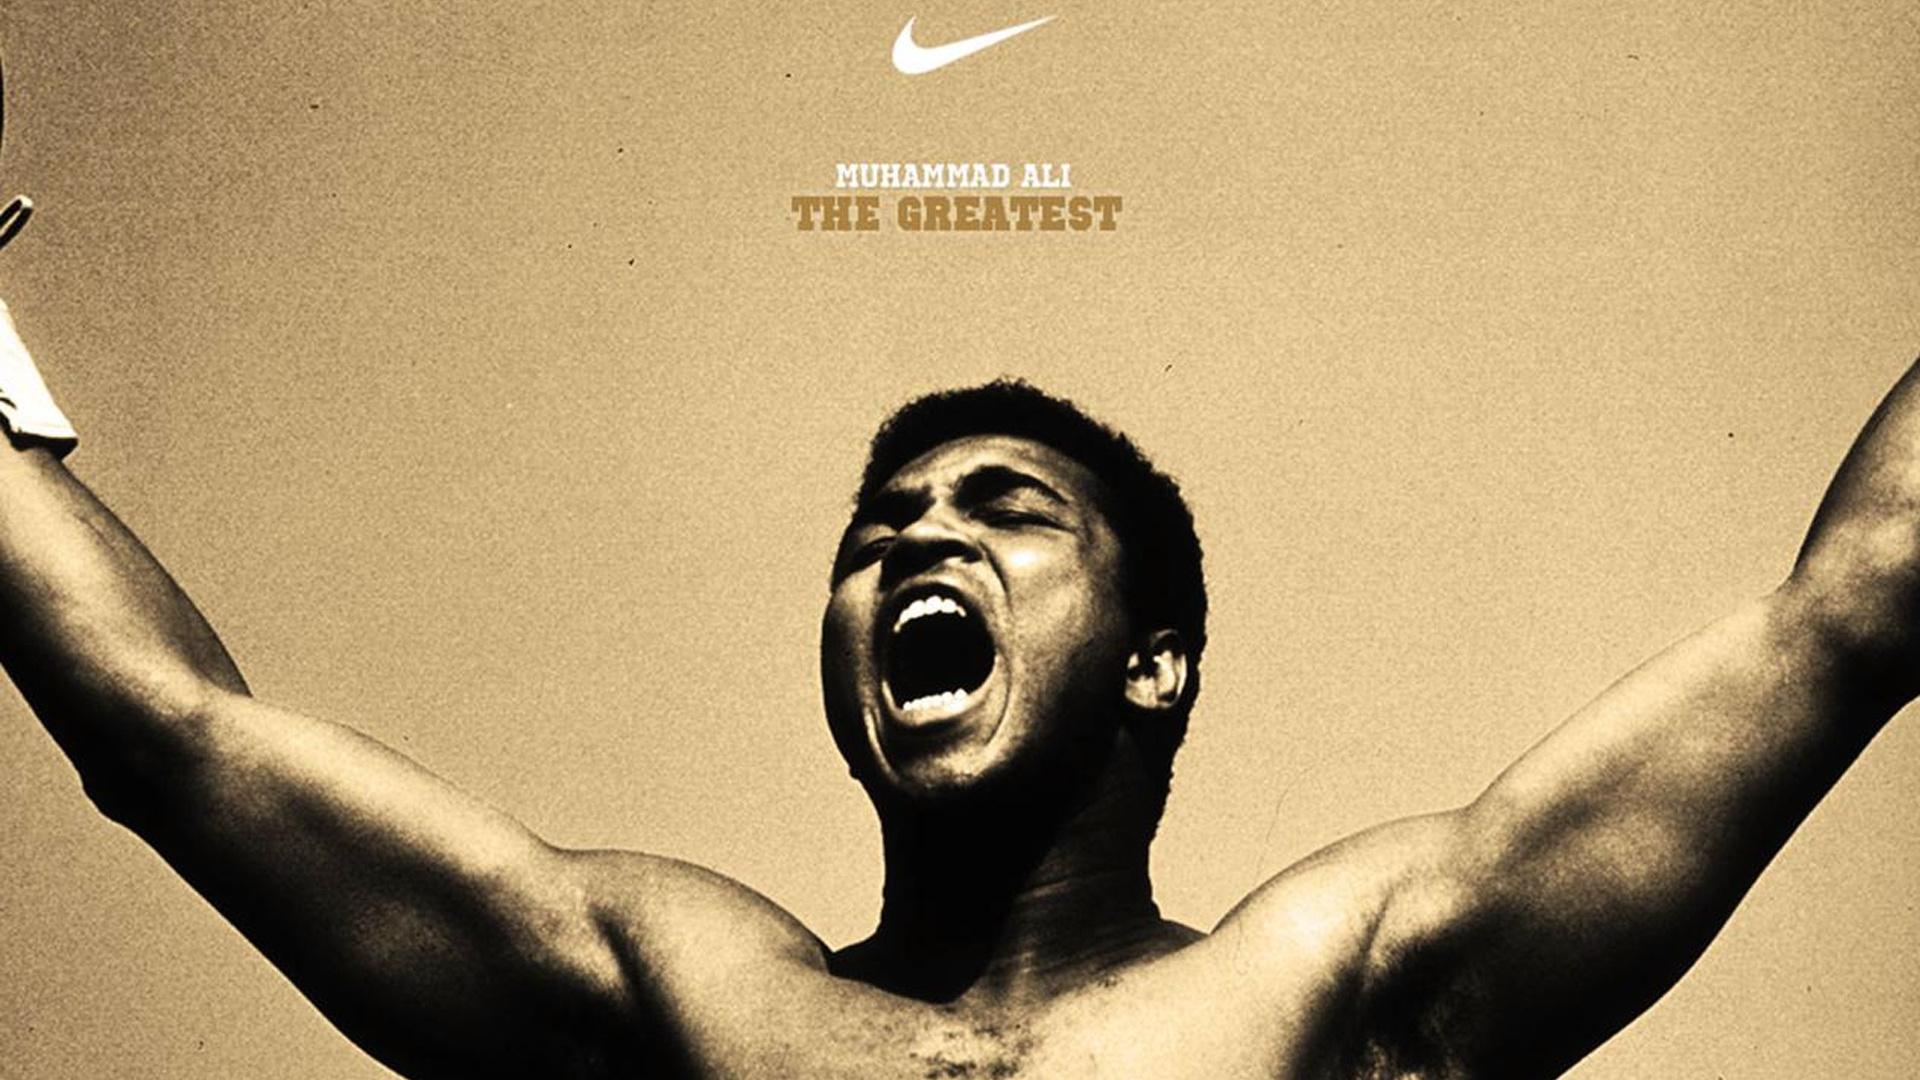 Muhammad Ali the boxer the legend nike nike 1920x1080 Wallpaper 1920x1080